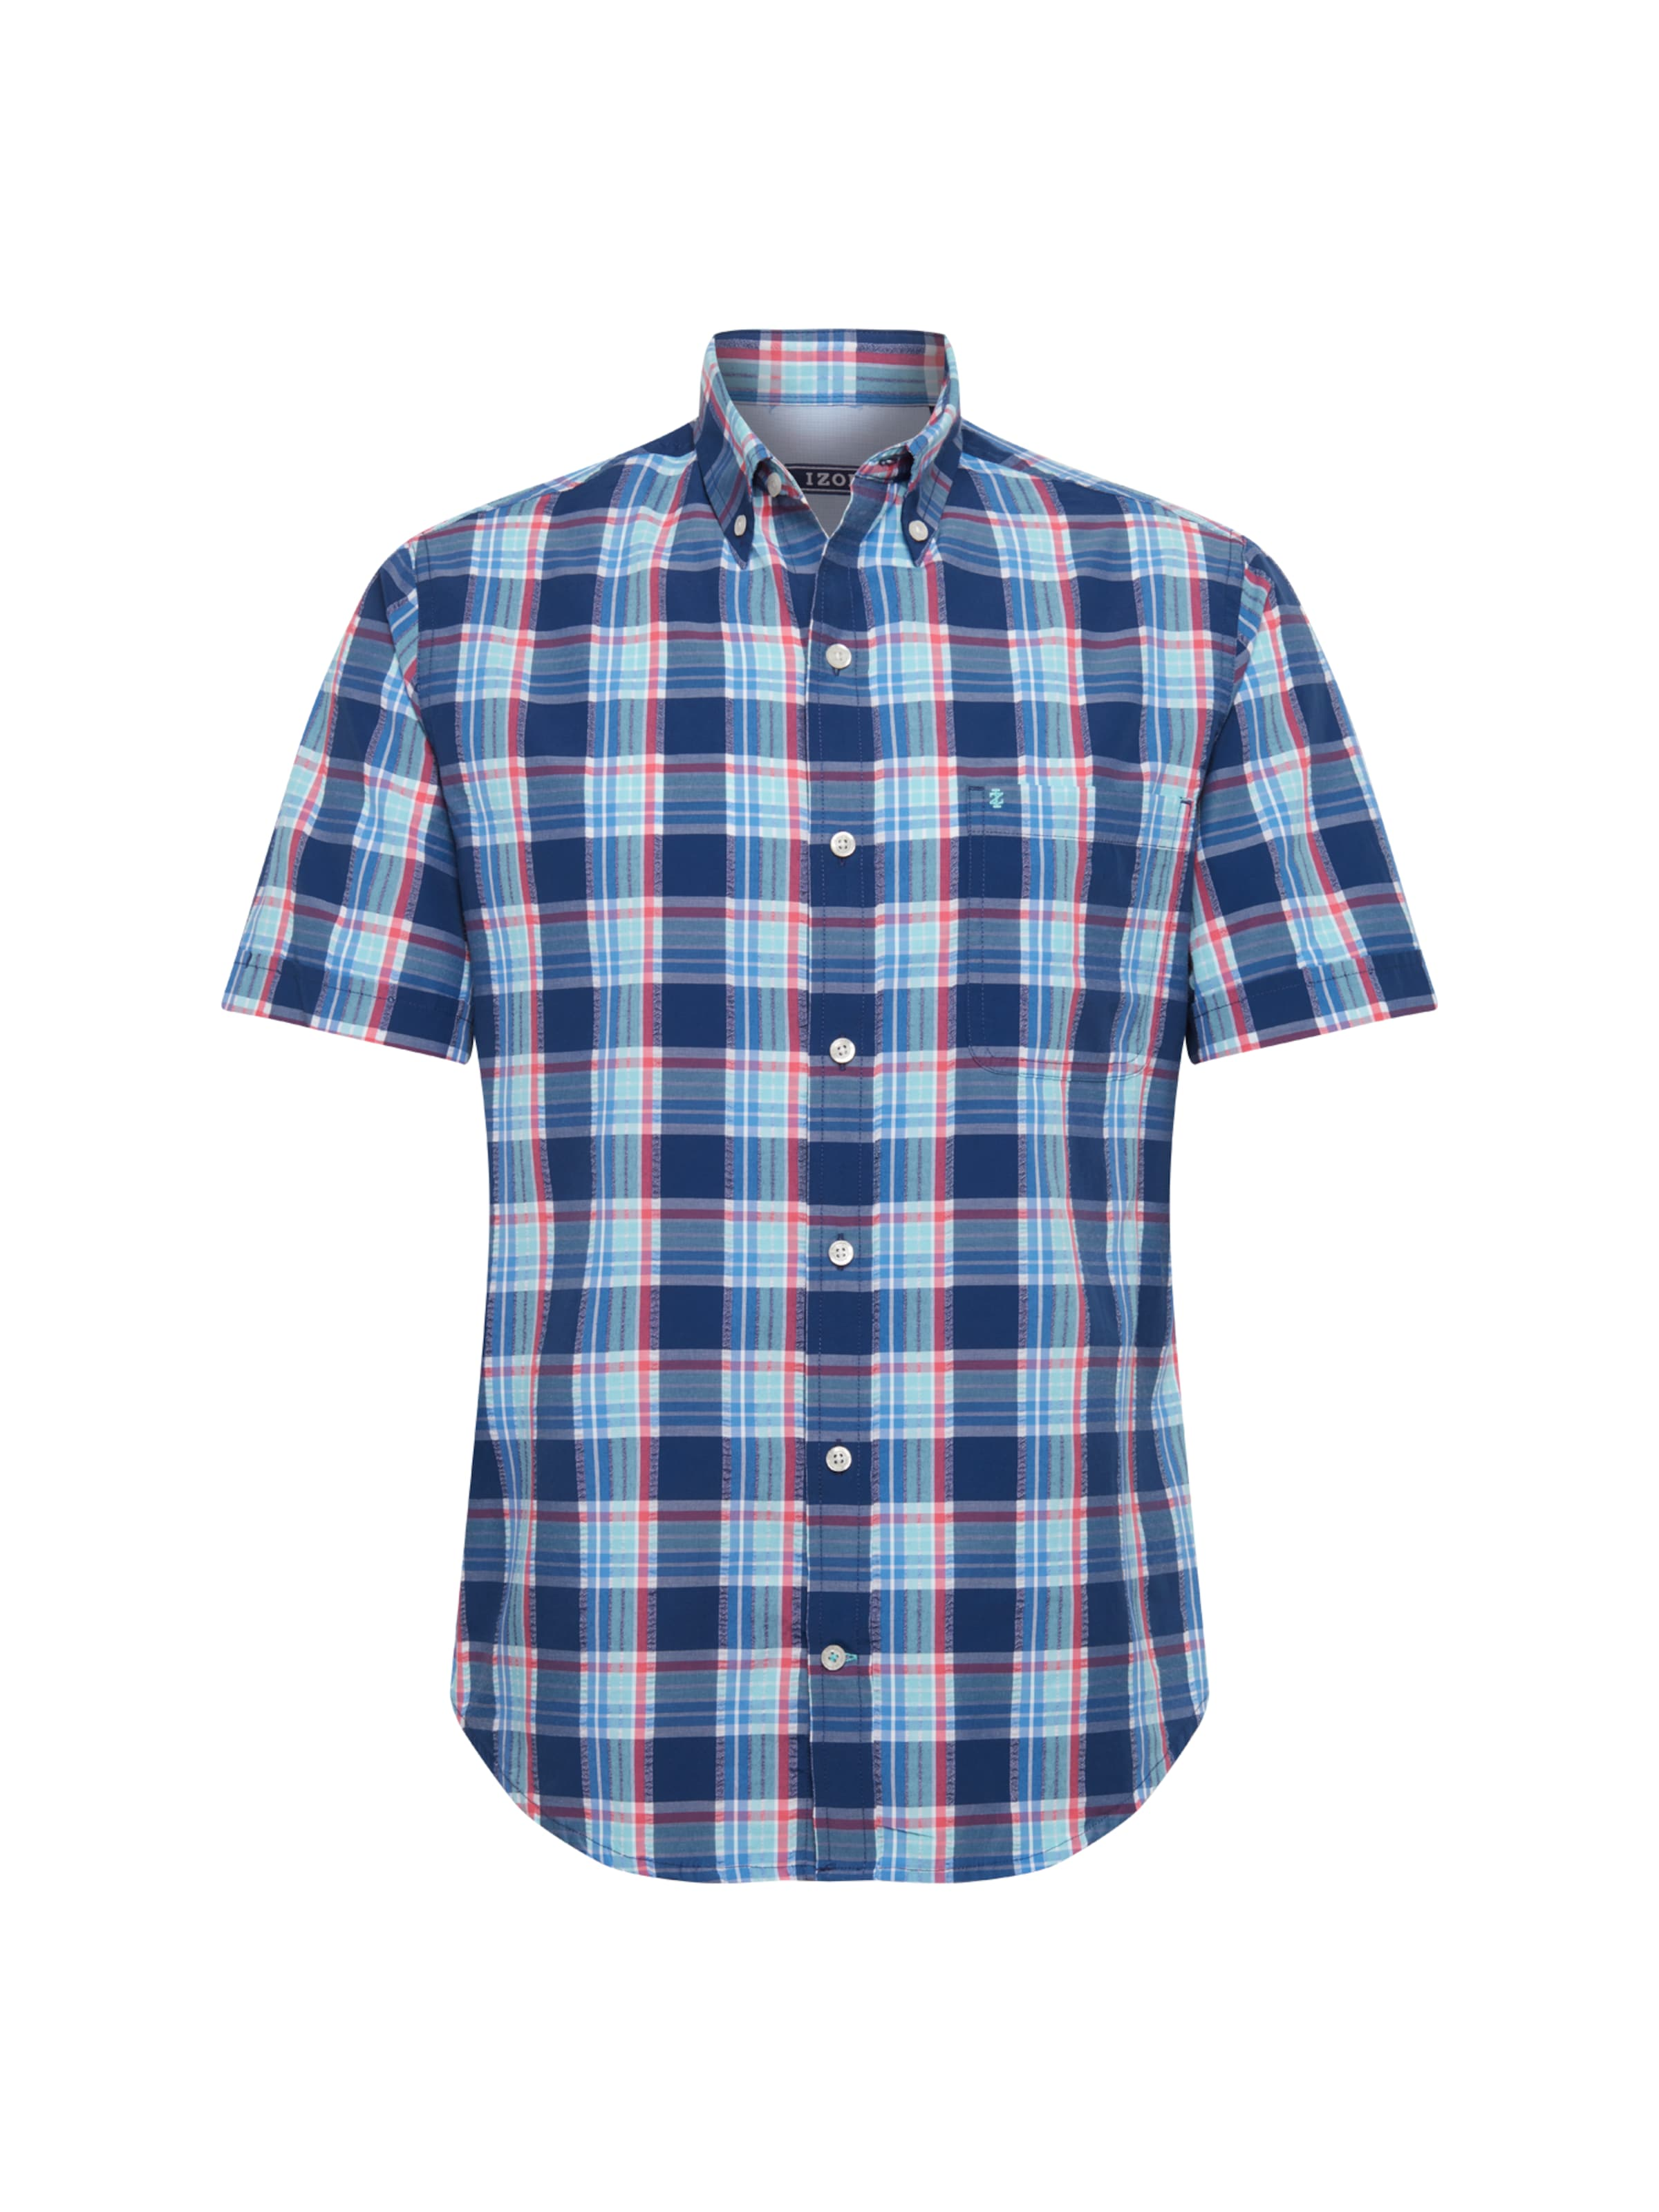 Shirt' Plaid Blau Hemd Bd 'seersucker Izod In Ss dtrQxshC